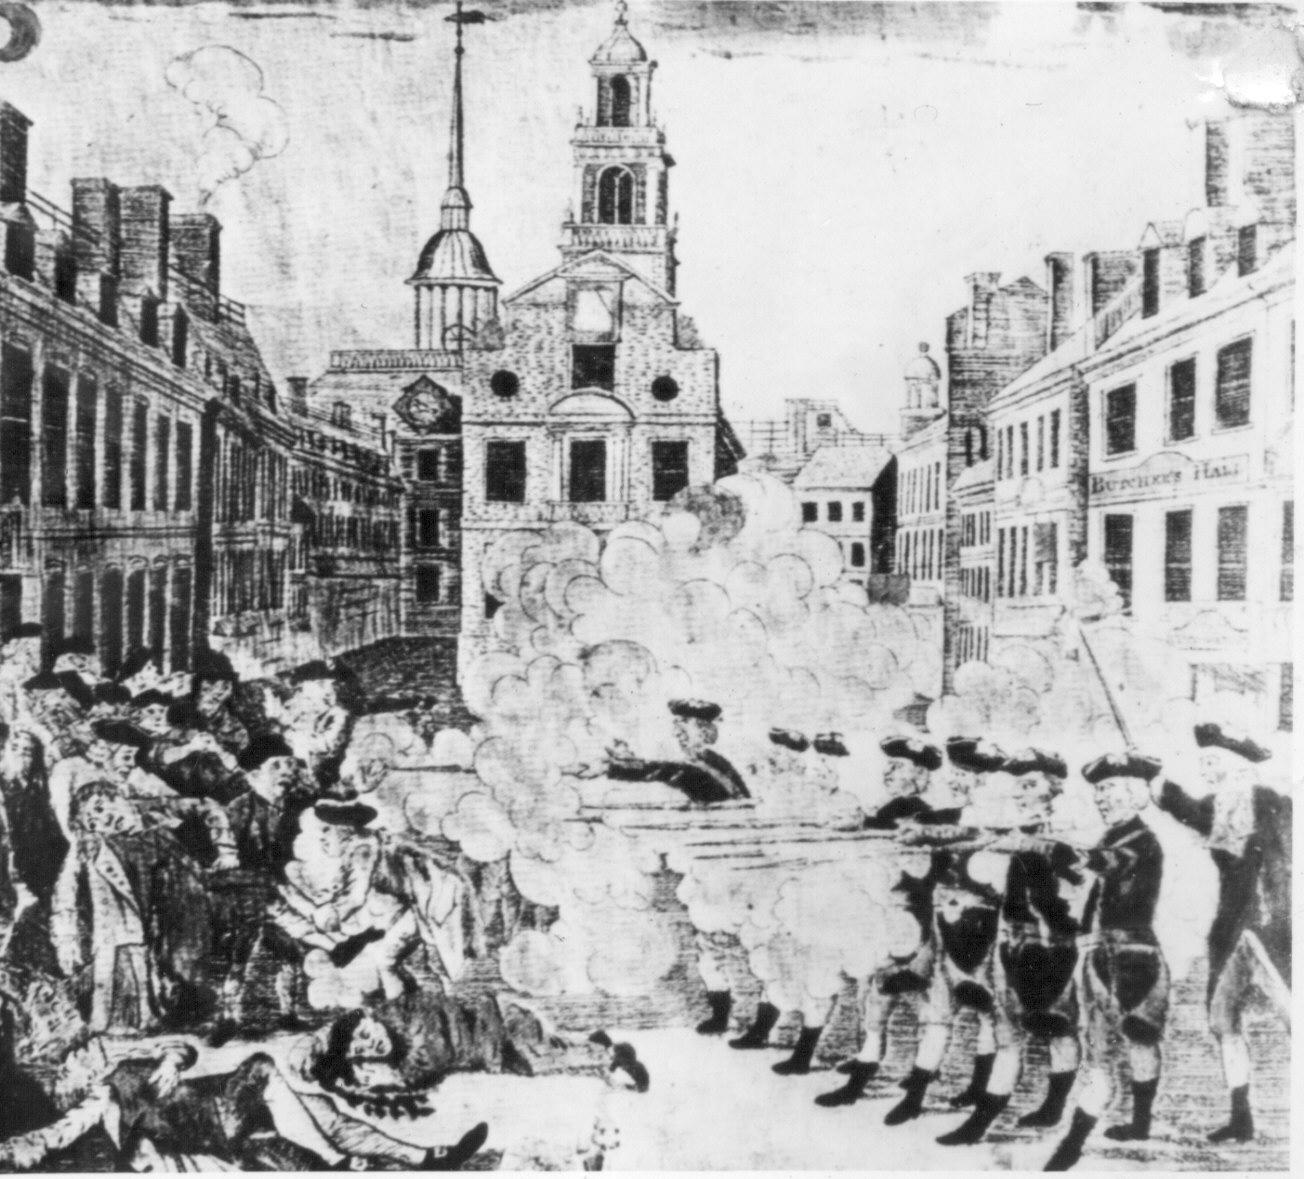 Propaganda Art Of The American Revolution